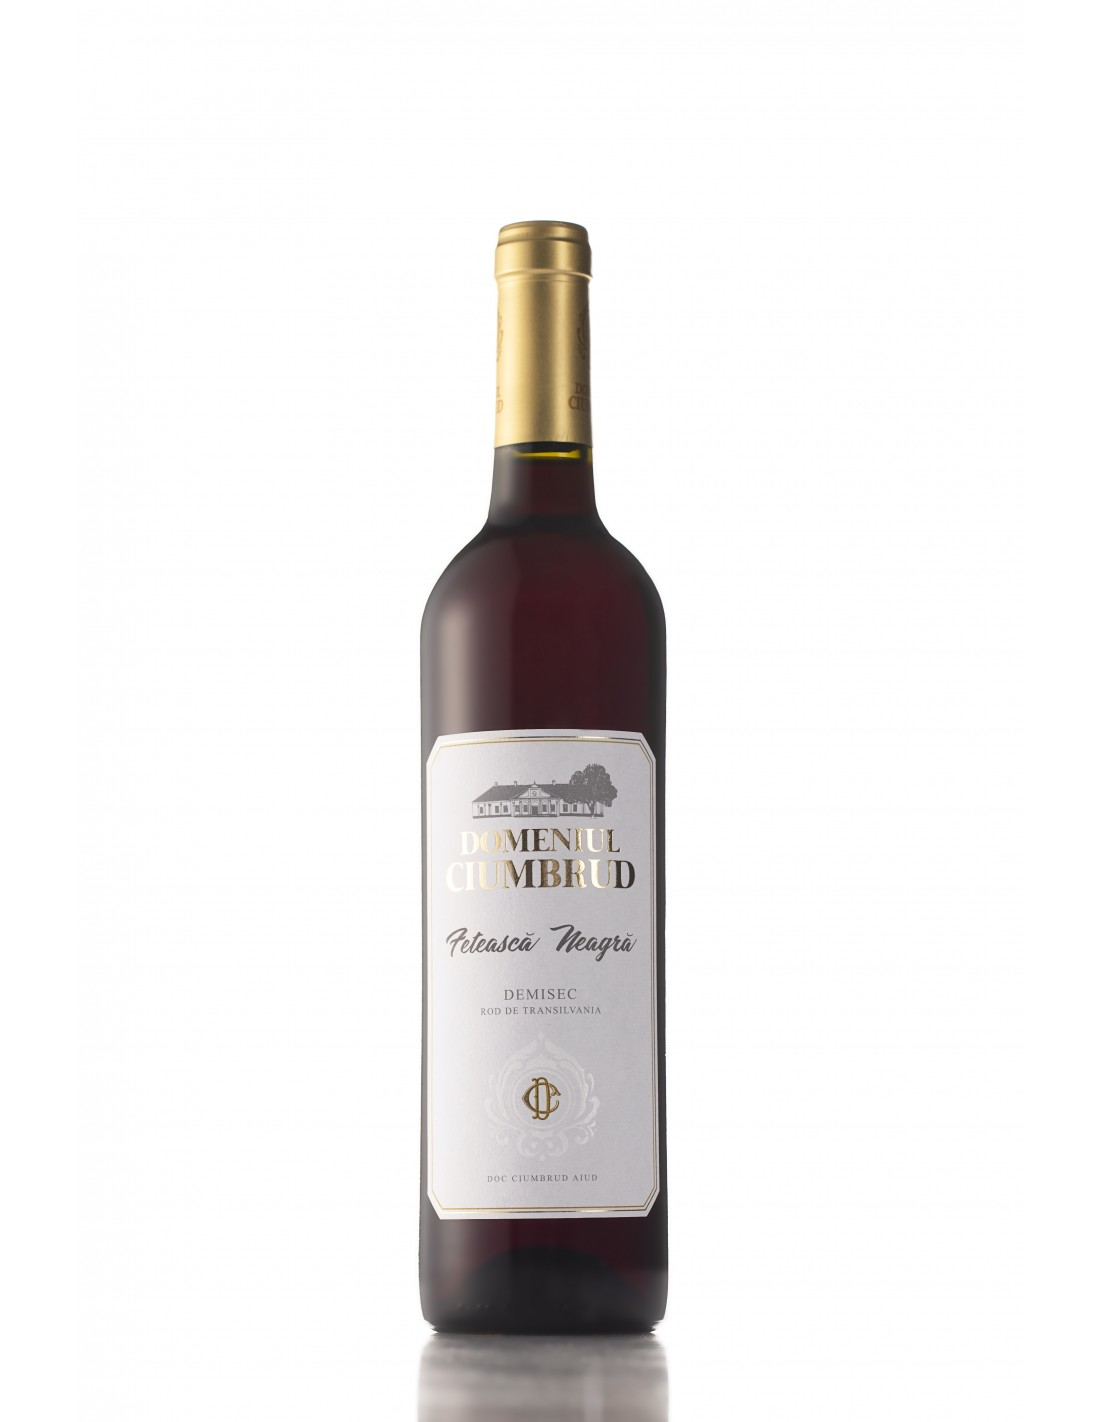 Vin rosu demisec, Feteasca Neagra, Domeniul Ciumbrud, 13.5% alc., 0.75L, Romania